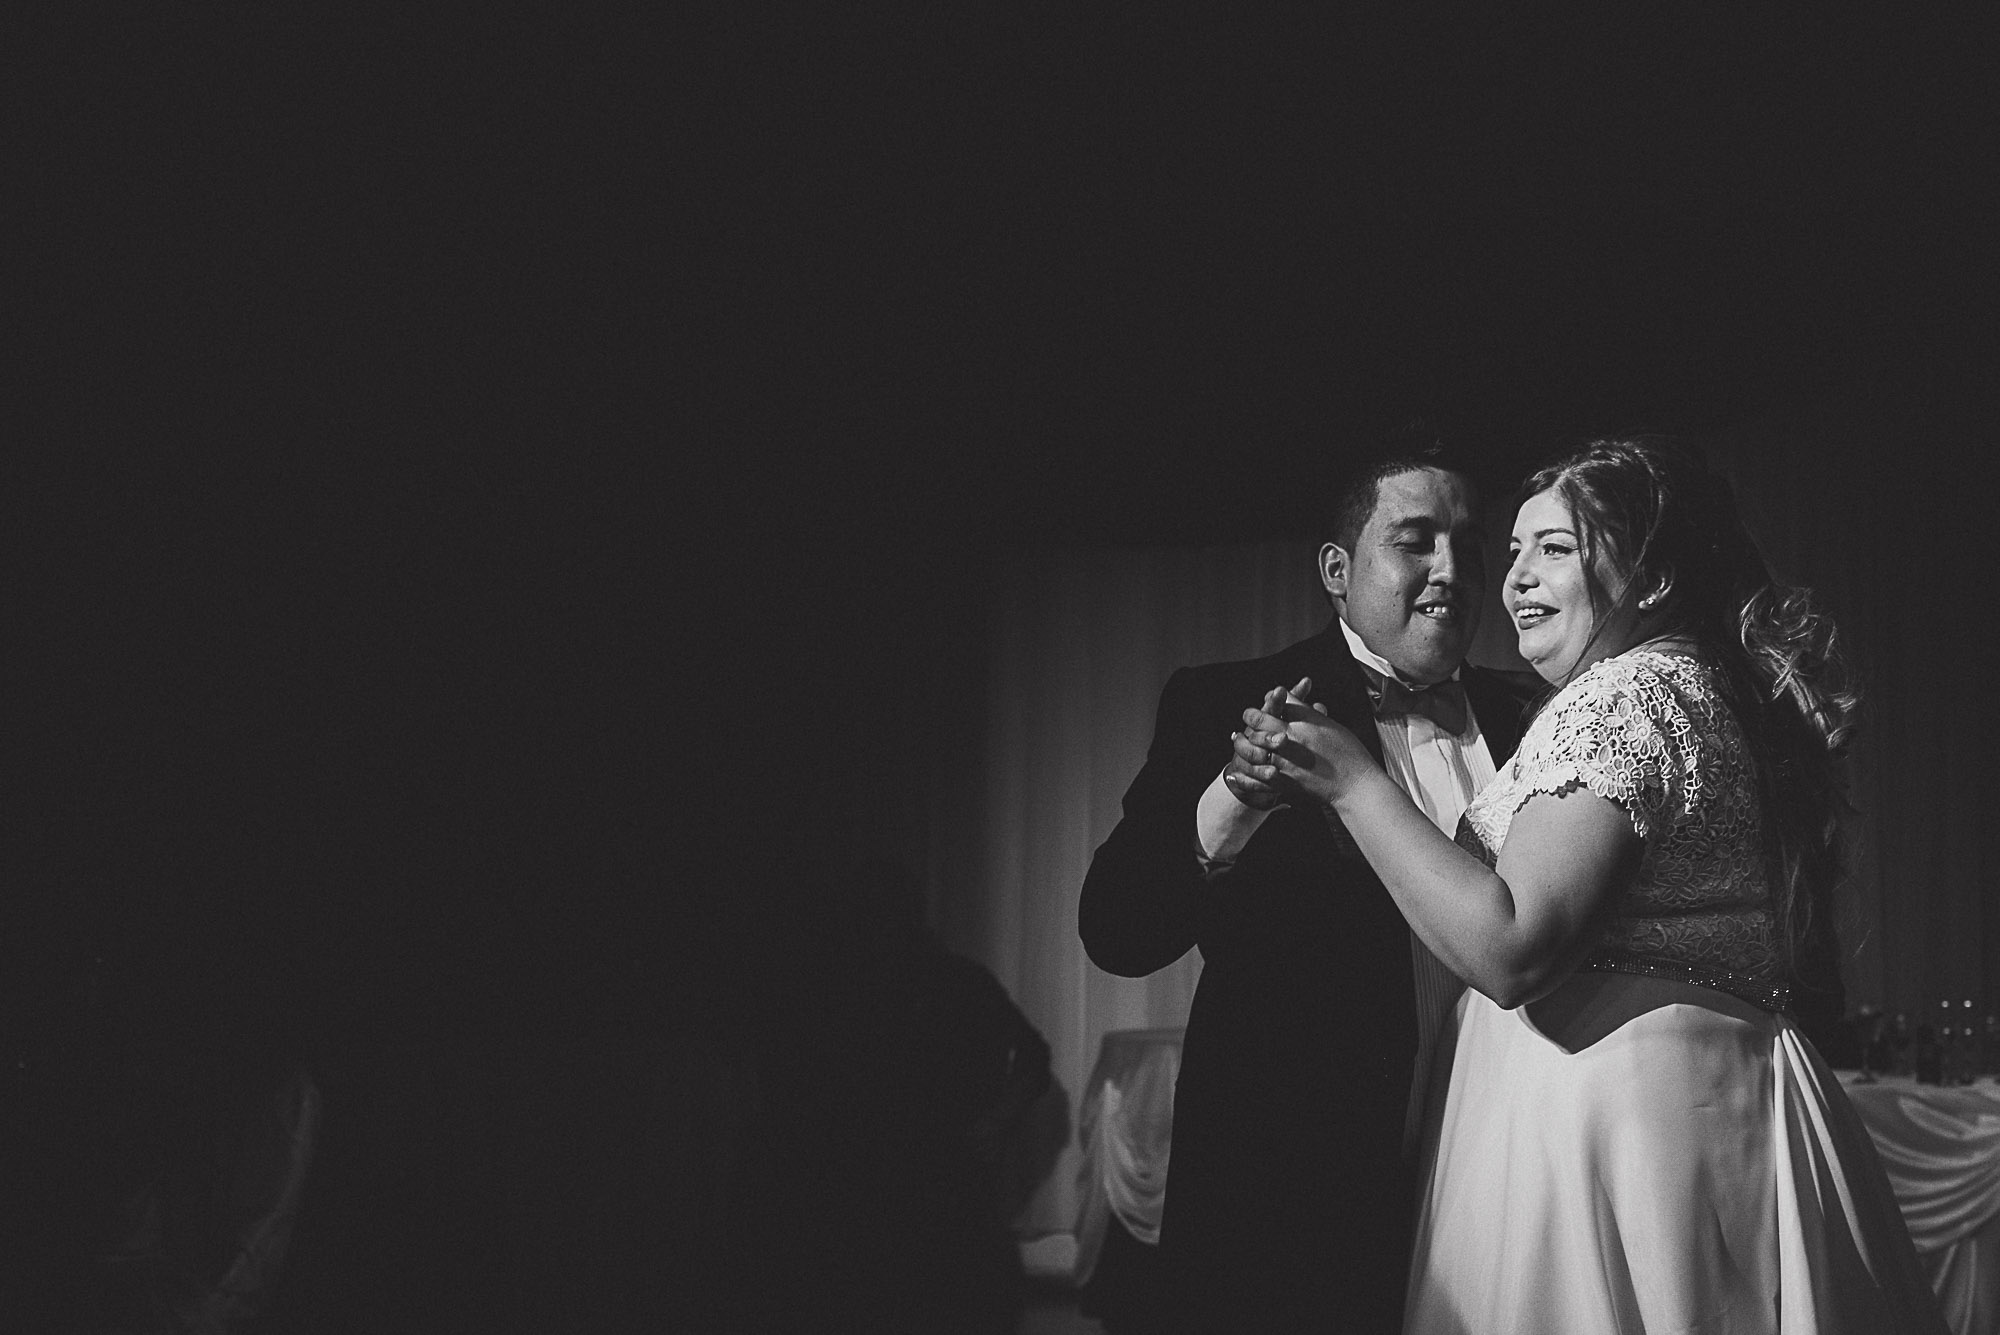 boda-vero-raul-patagonia-argentina-chilena-fotografo-de-bodas-argentina-casamiento-en-patagonia-gabriel-roa-photography-24